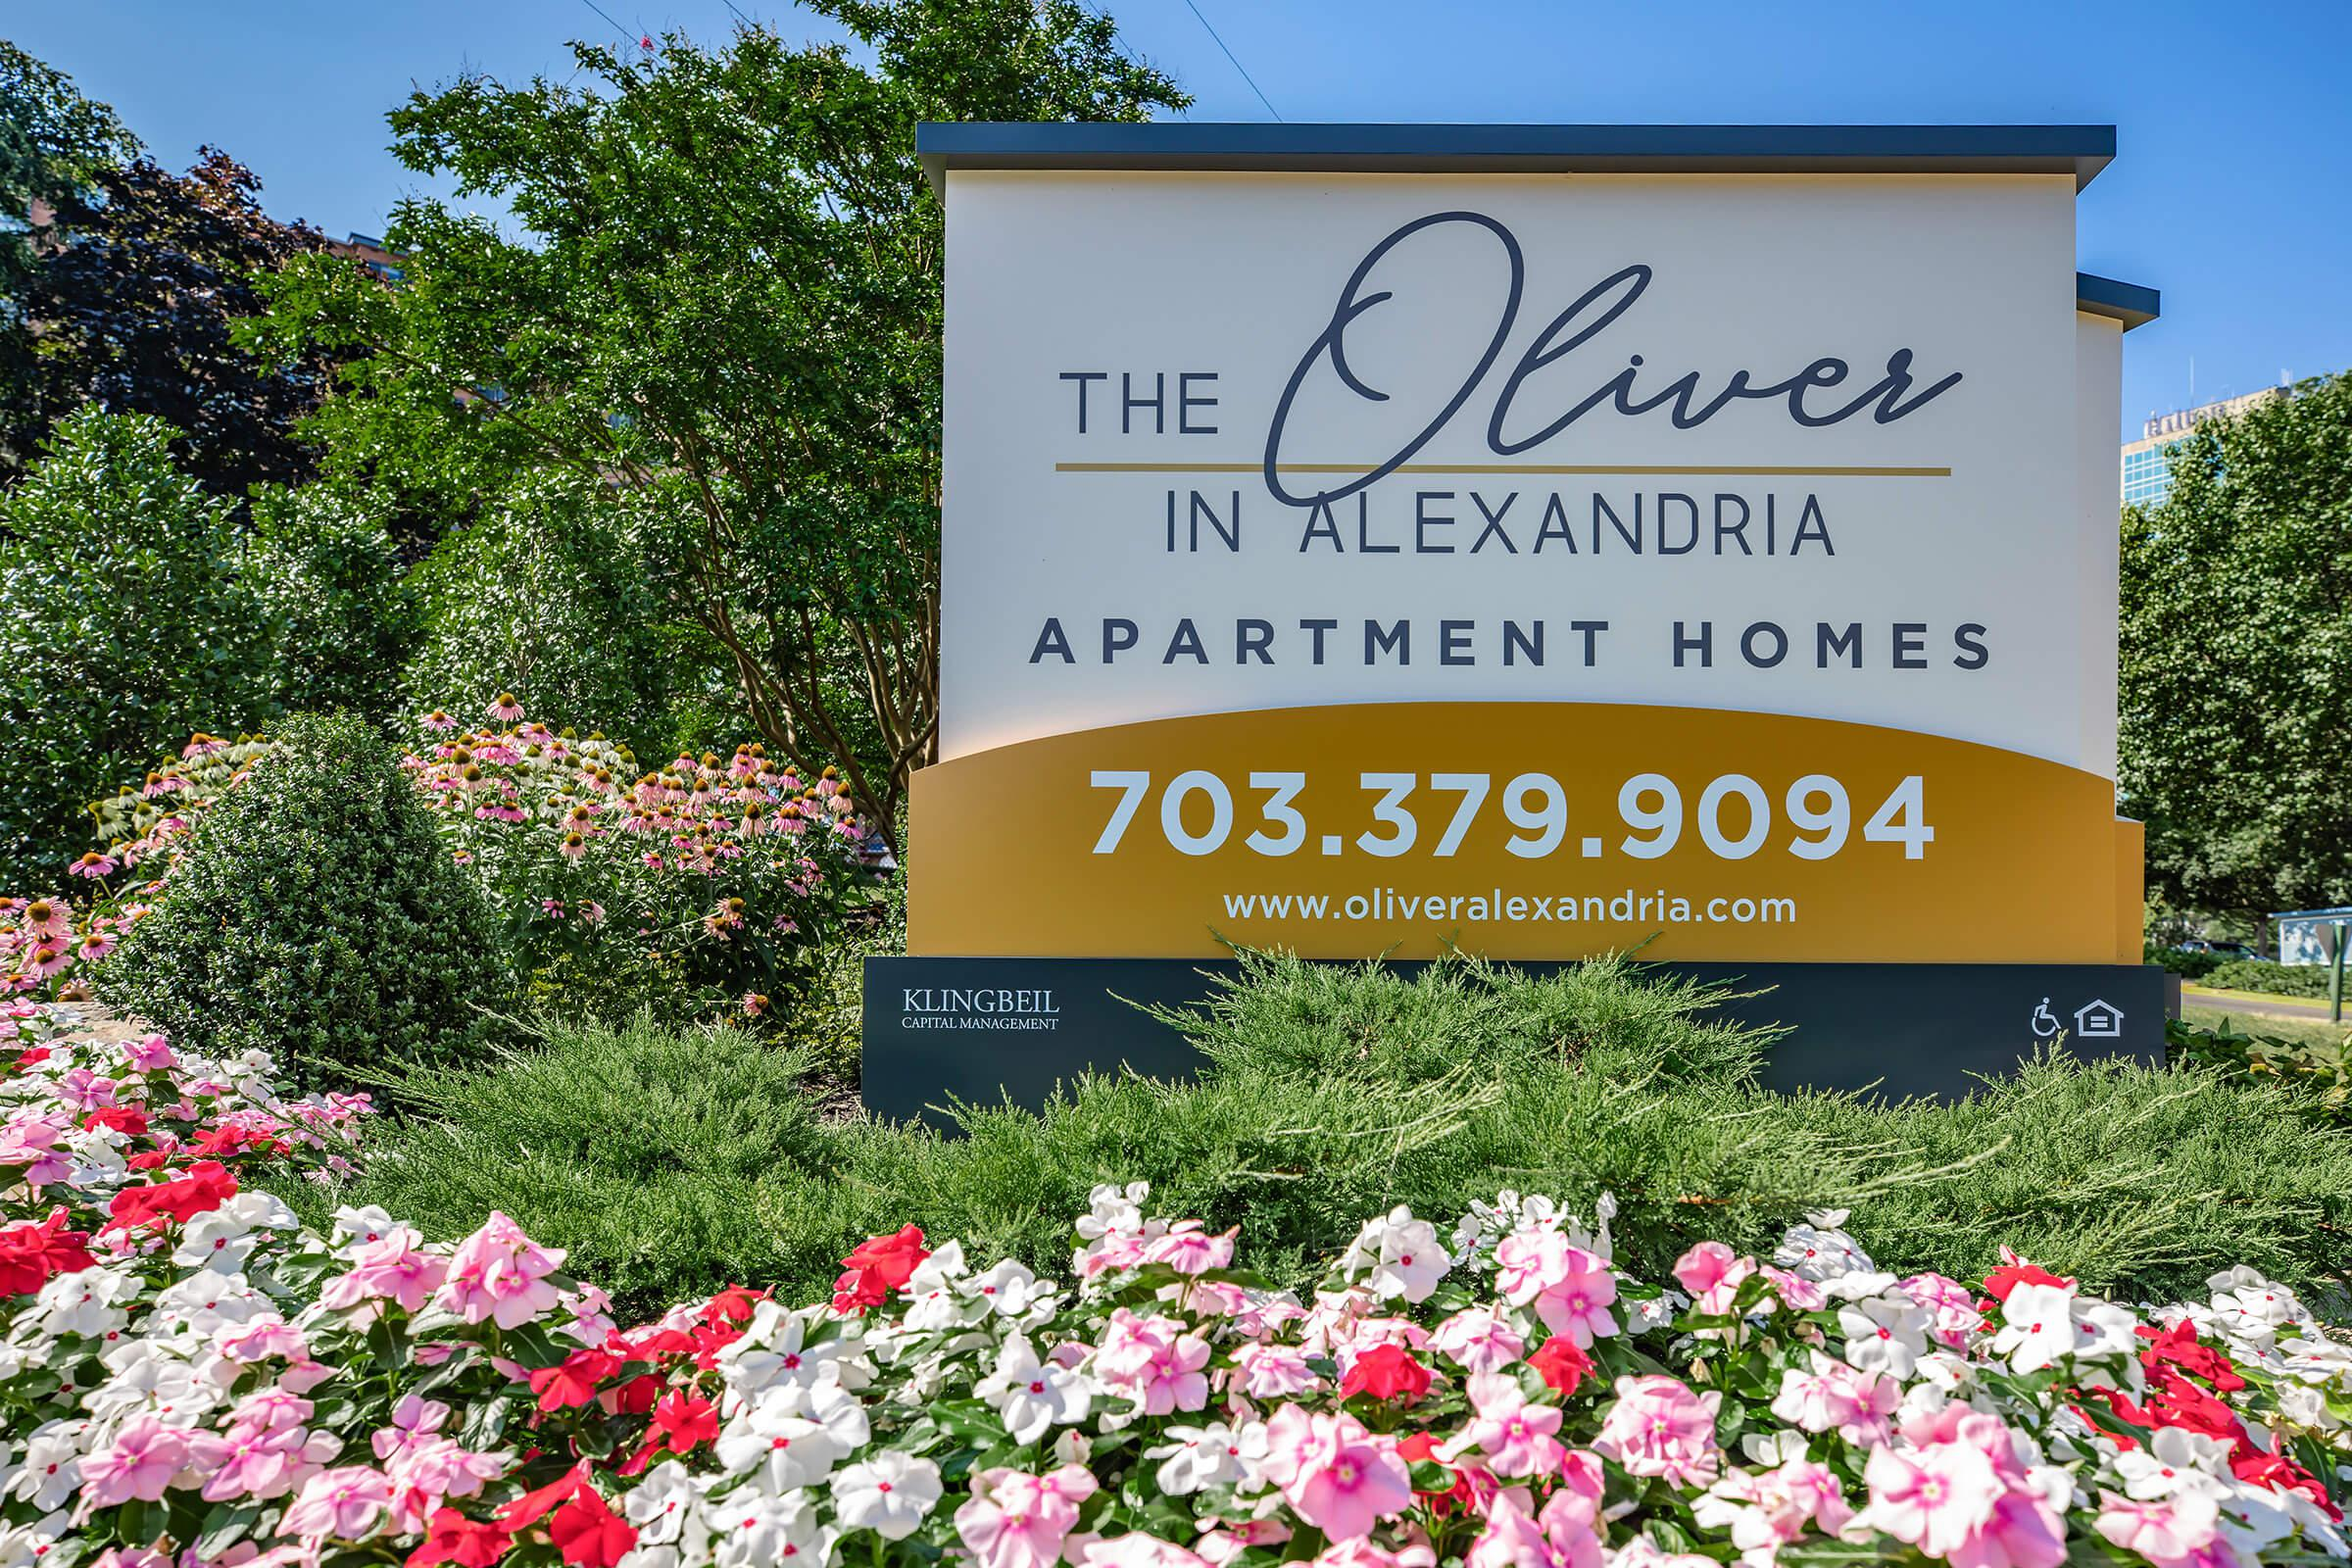 Landscaping at The oliver in Alexandria in Alexandria, VA